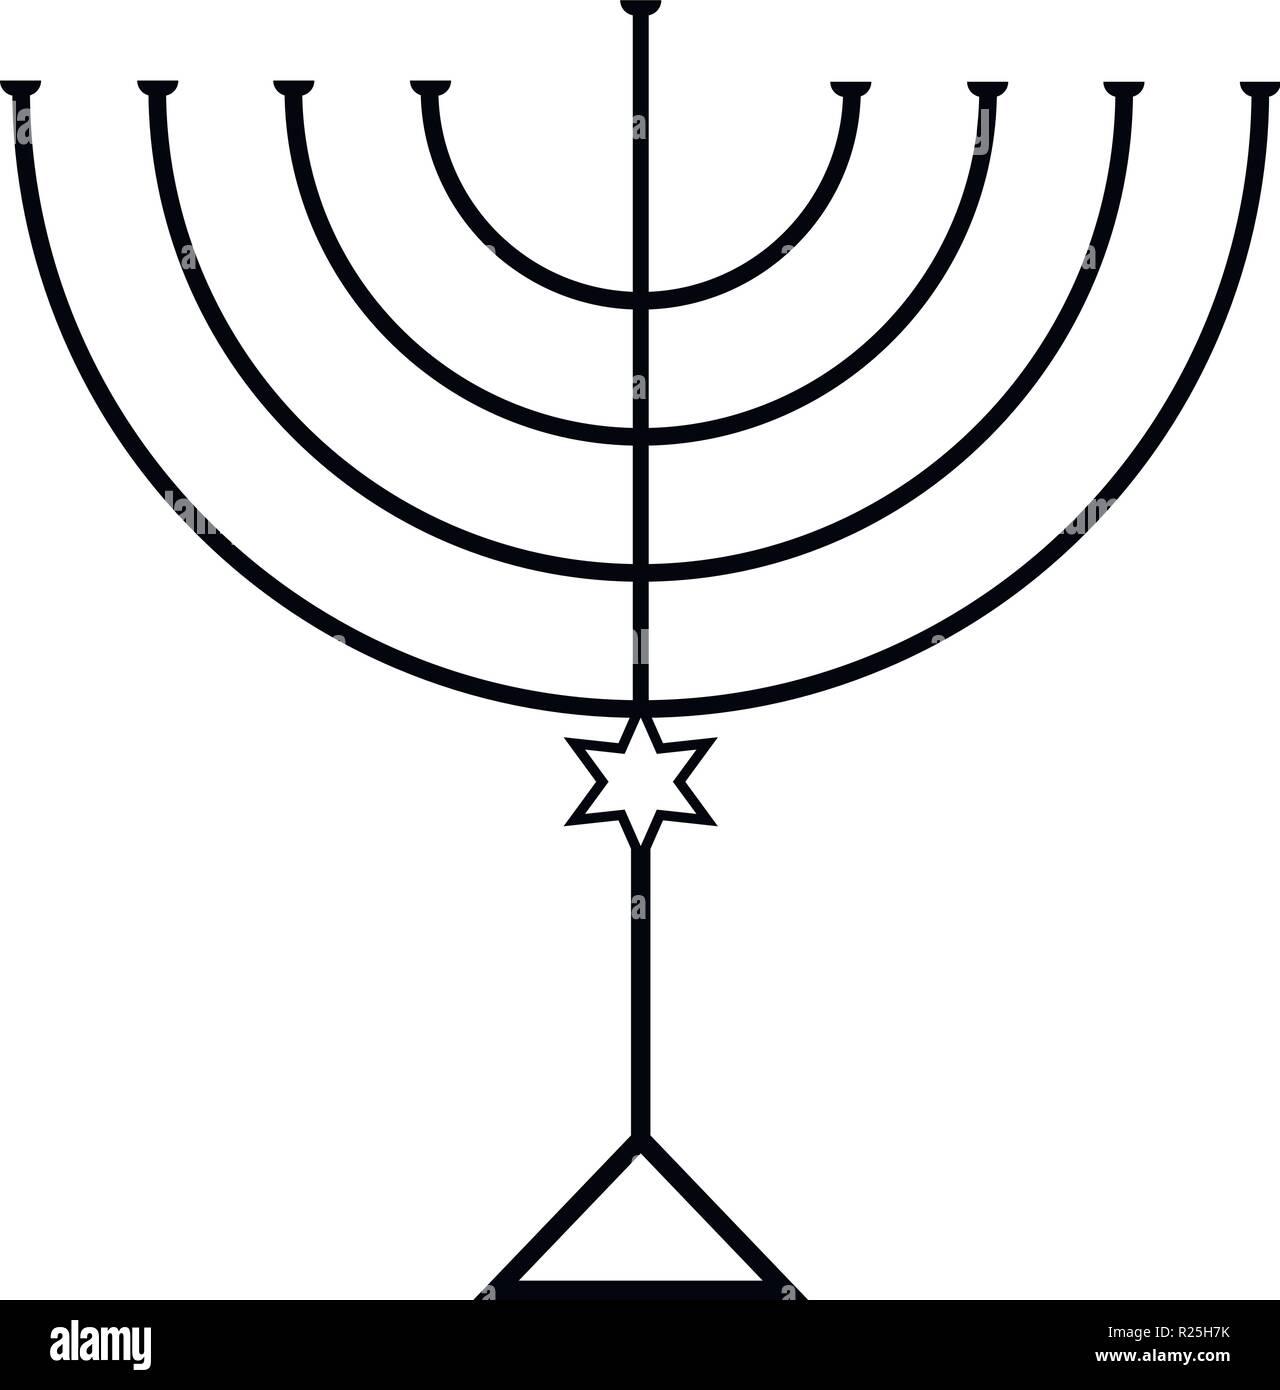 Menorah for Hanukkah, Vector illustration. Religion icon. - Stock Vector